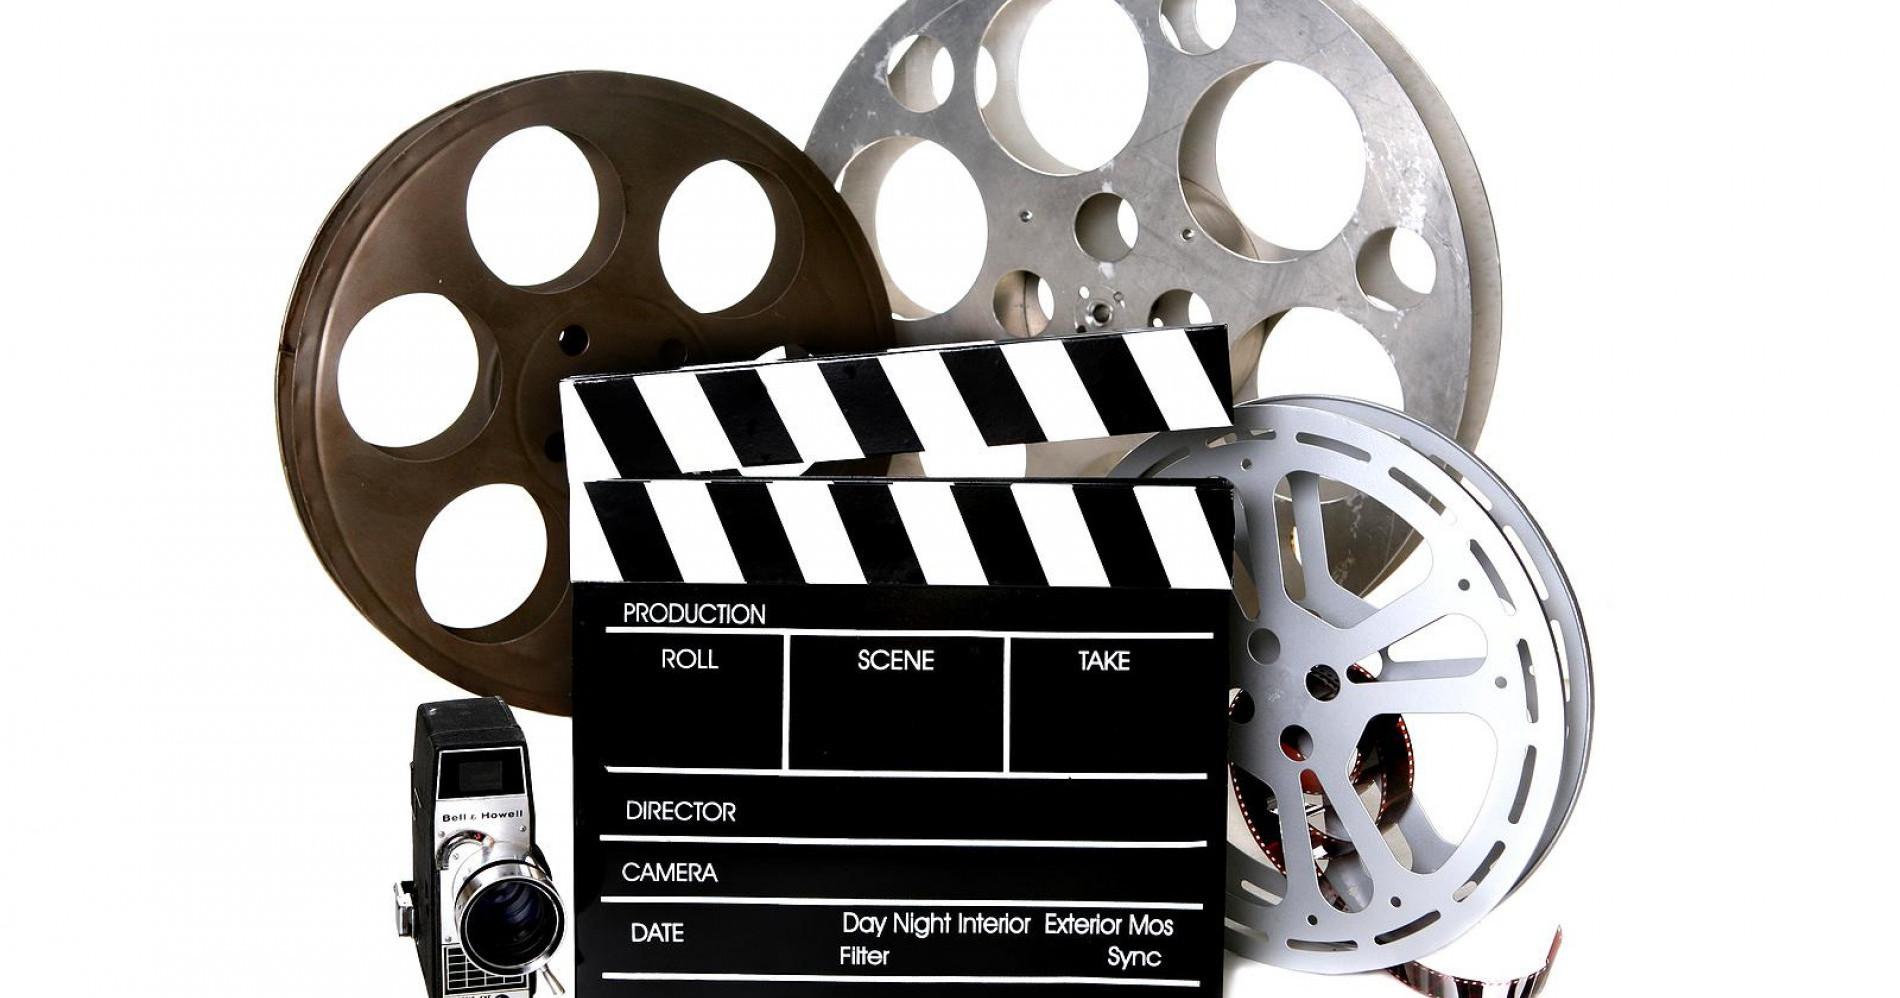 Ilustrasi gulungan film, kamera dan cleeperboard (Sumber gambar : Indonesia.go.id)